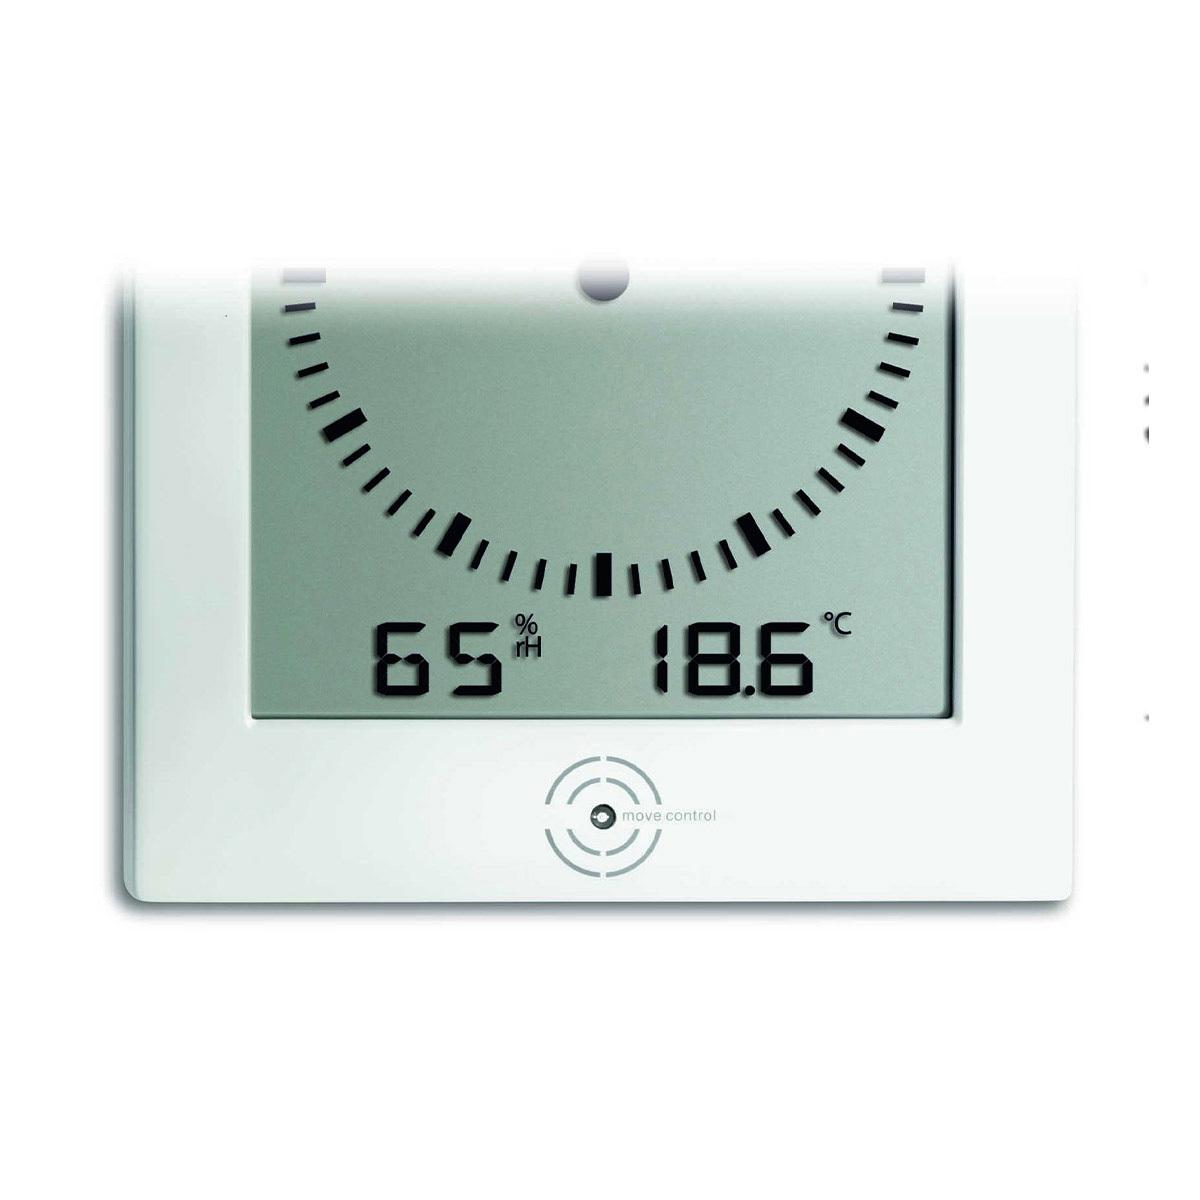 60-4506-digitale-funk-wanduhr-mit-analogem-zifferblatt-raumklima-datum-ansicht2-1200x1200px.jpg